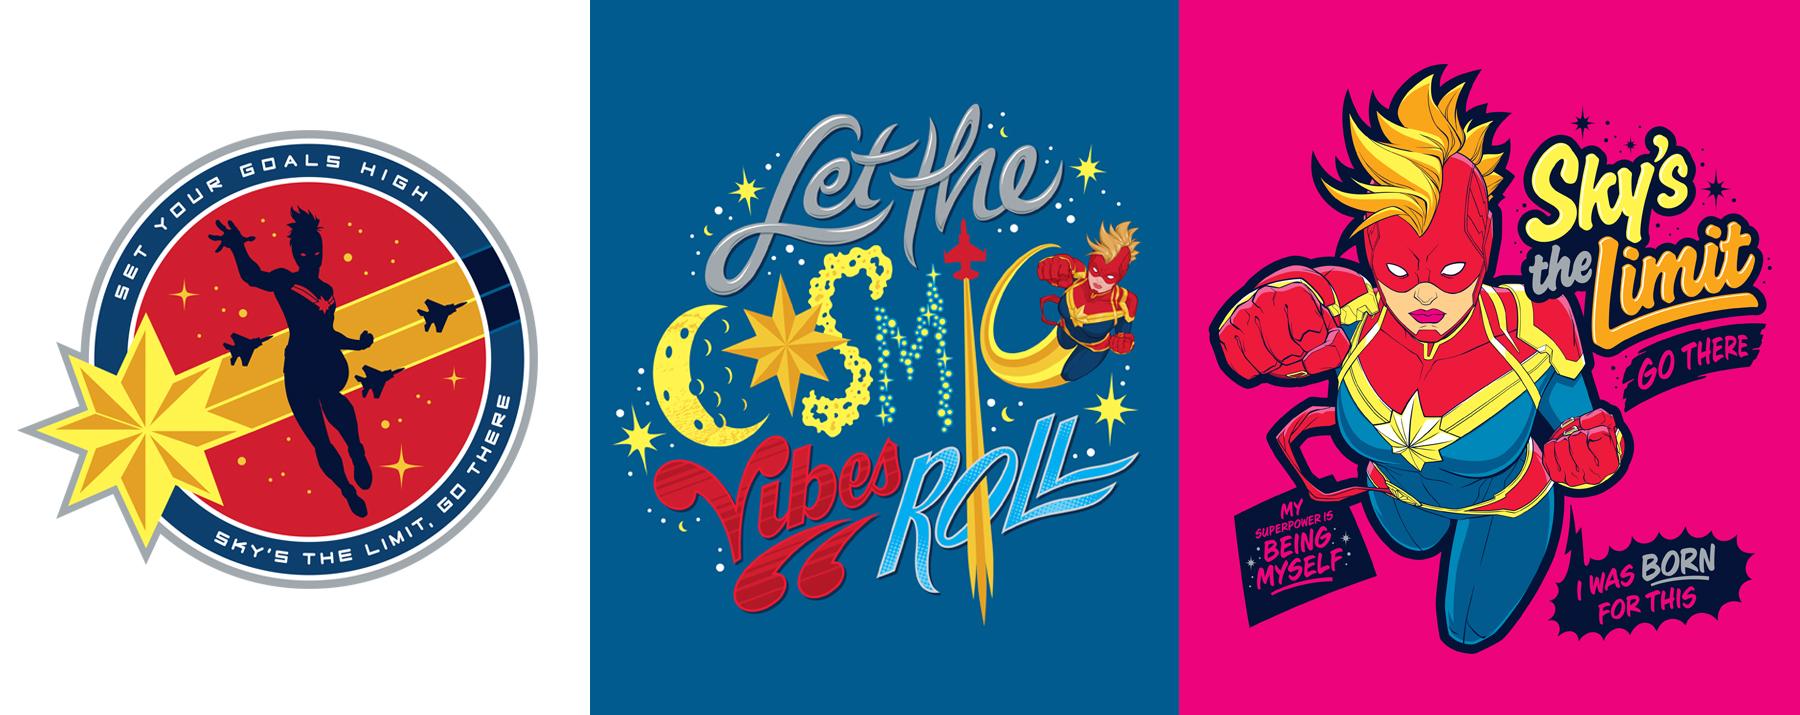 Captain Marvel Style Guide Design - Panel 3